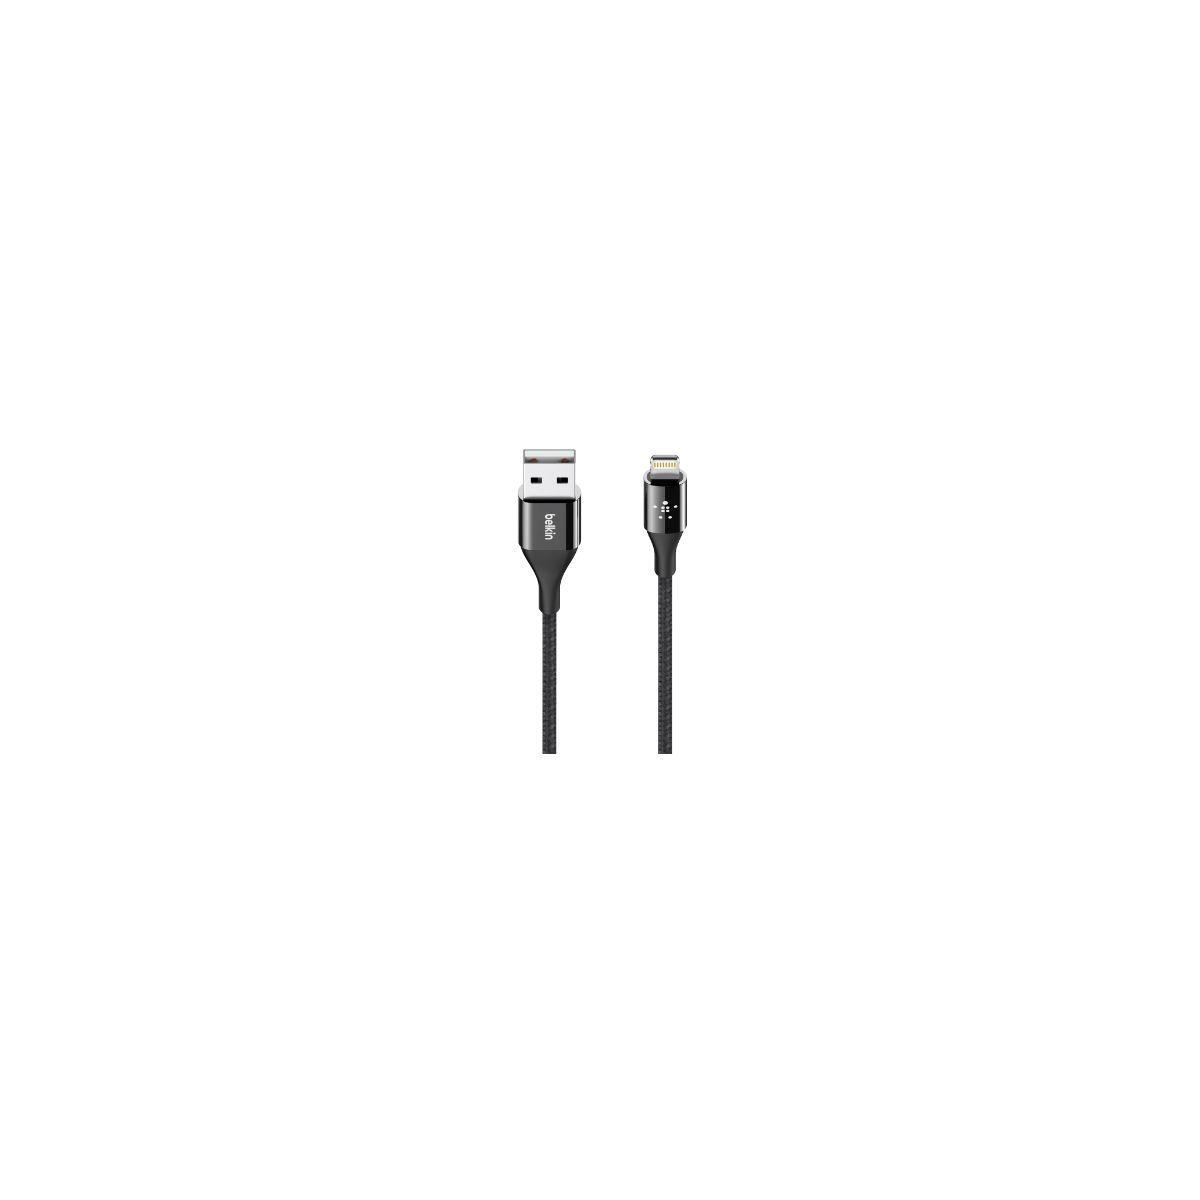 Câble lightning belkin kevlar 1m20 noir - 10% de remise immédiate avec le code : multi10 (photo)